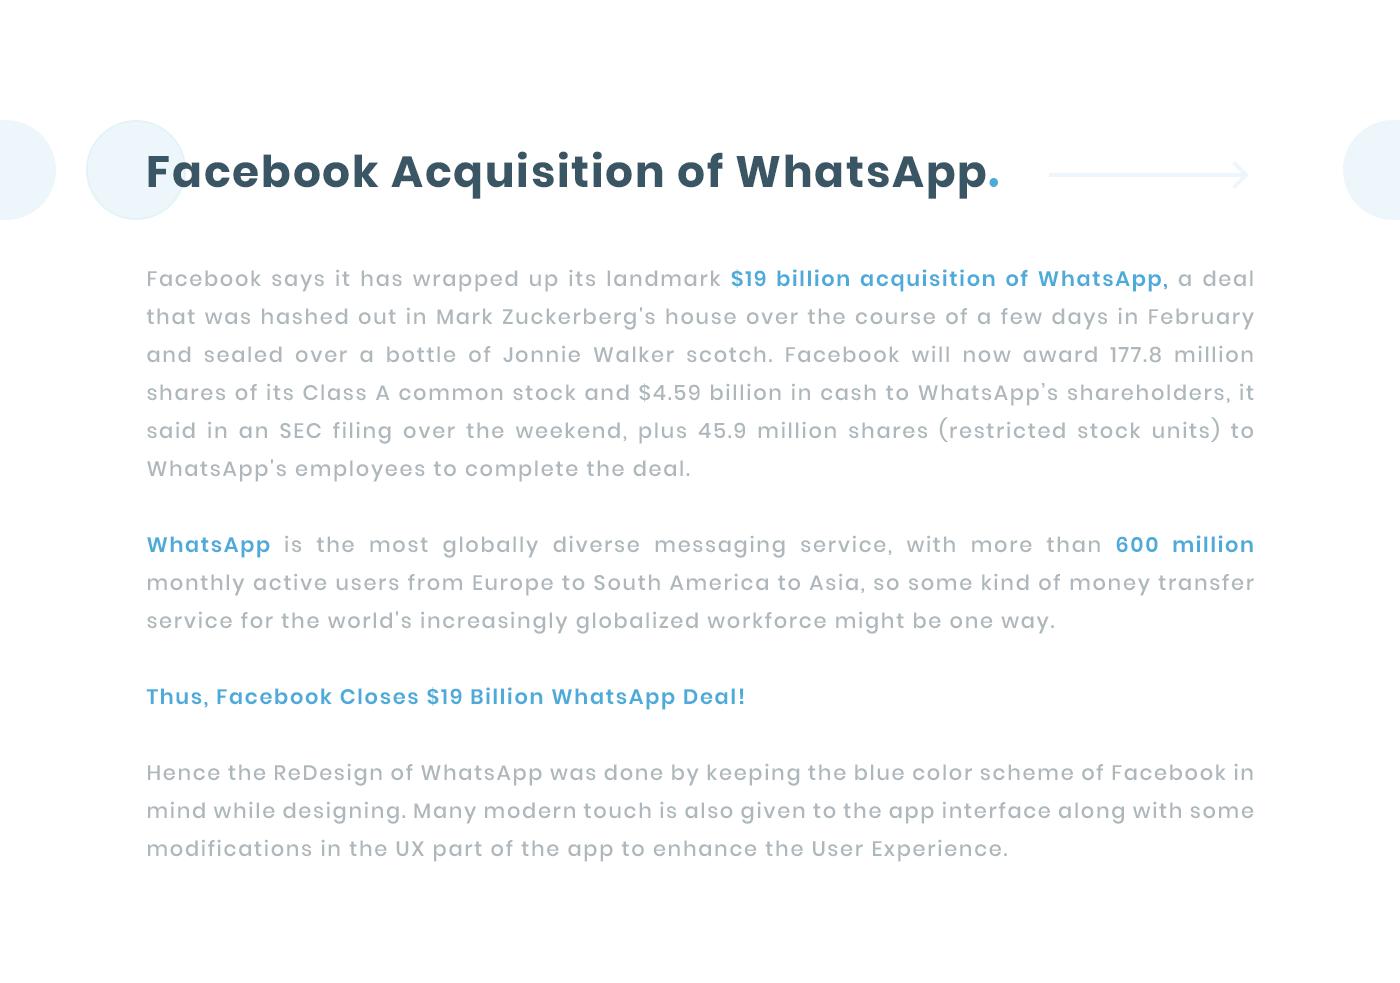 UI ux android app Chat Adobe XD freebie free ui kit WhatsApp MadeWithAdobeXd